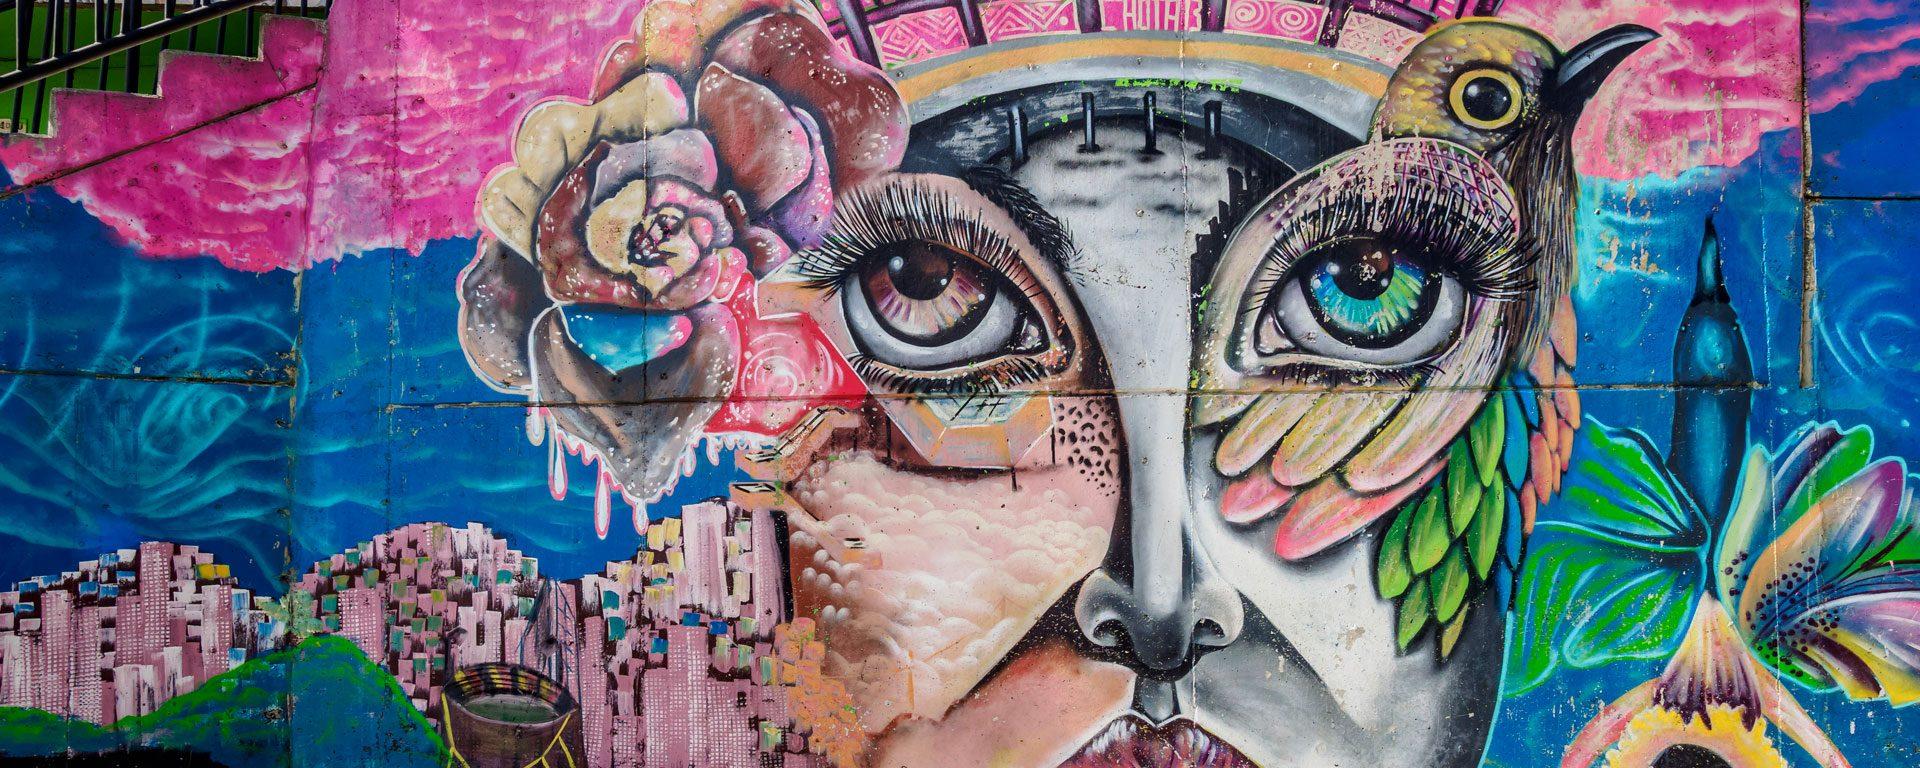 Colorful street art in Comuna 13 in Medellin, Colombia